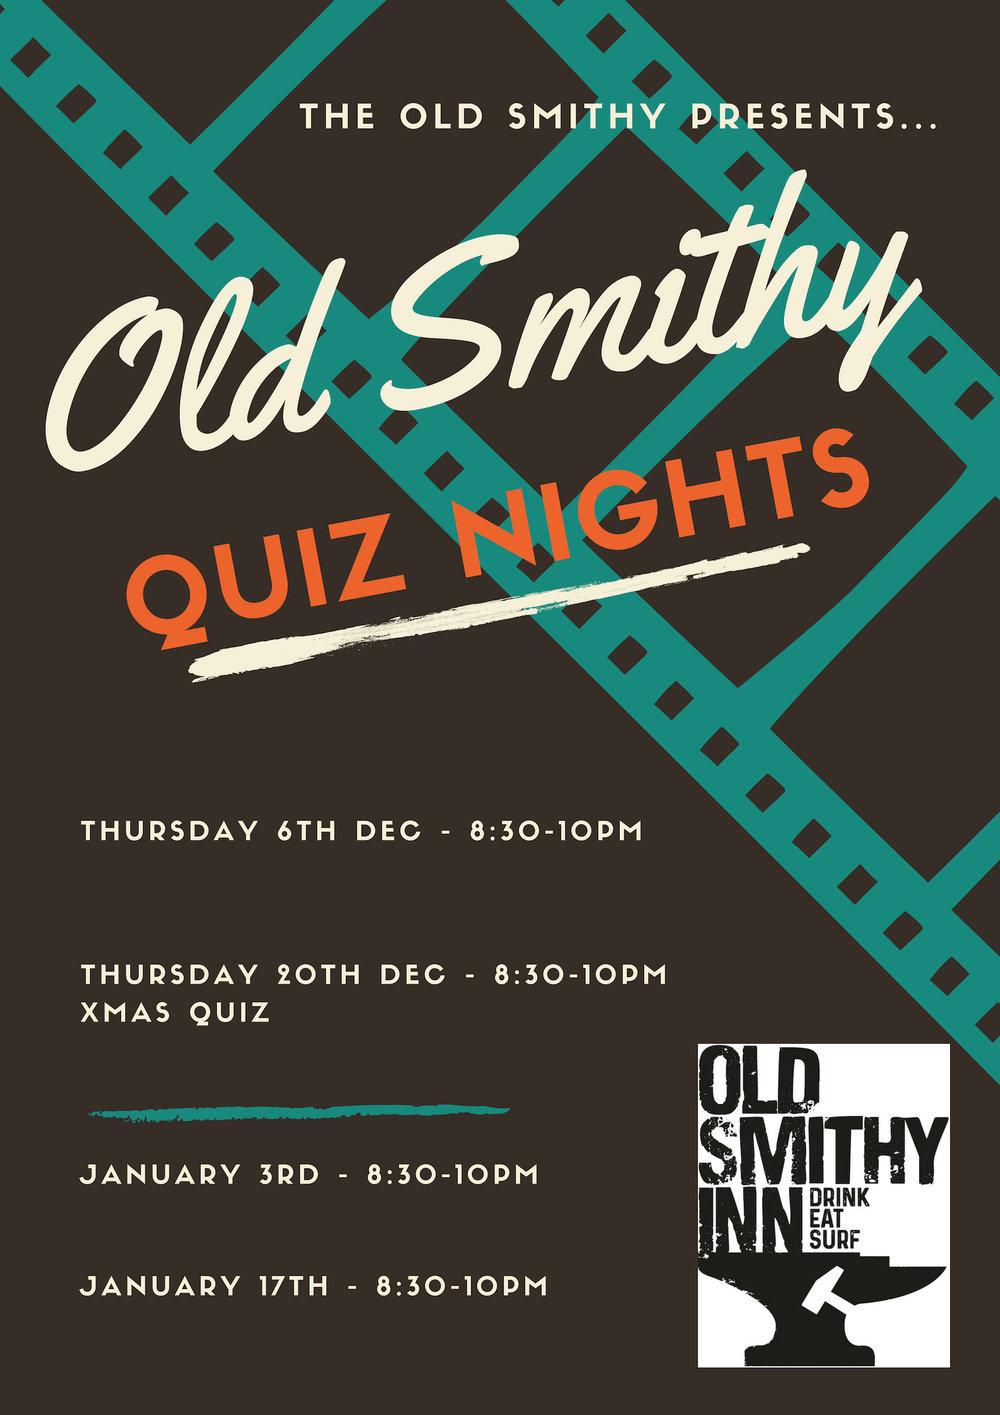 Old Smithy.jpg